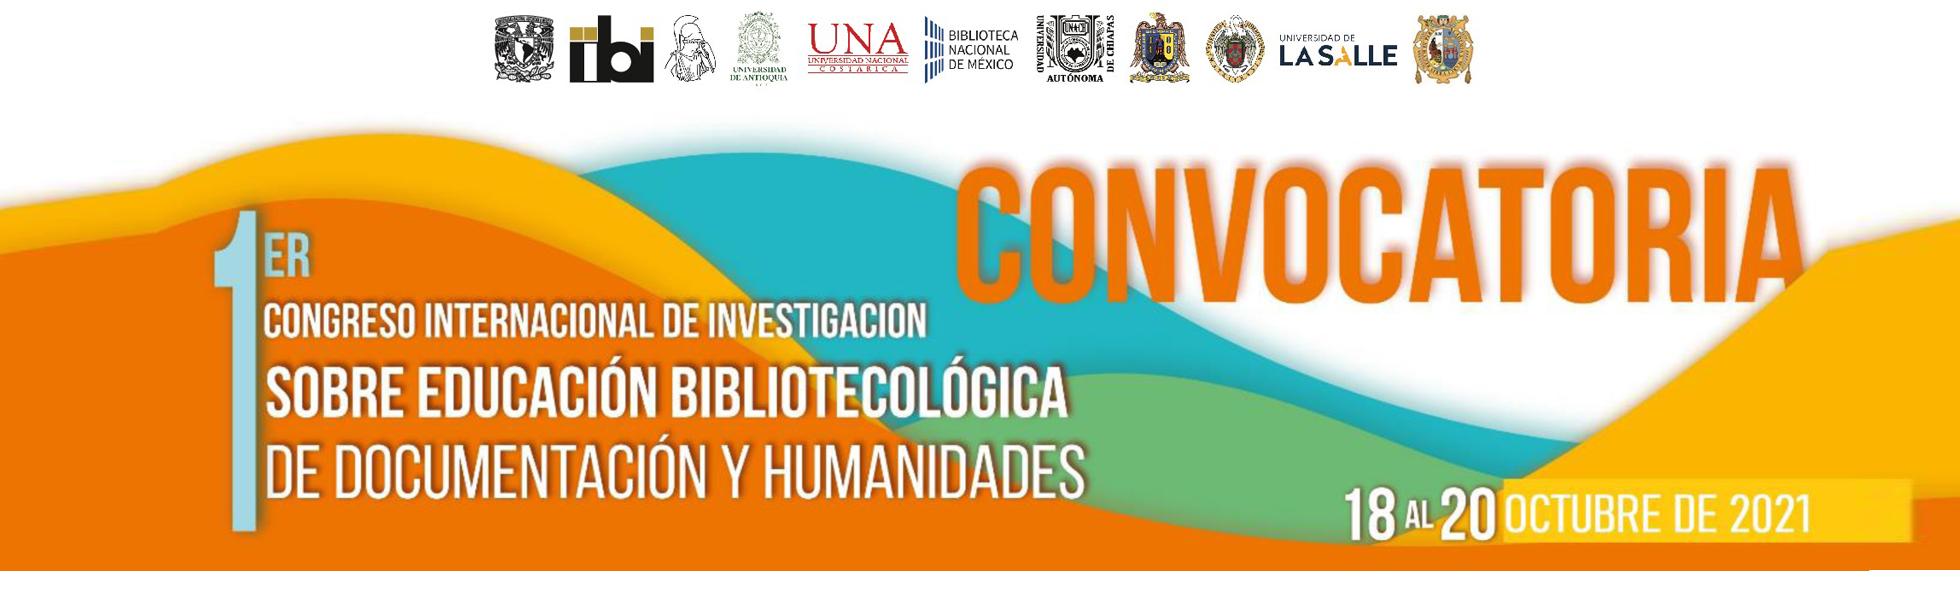 I Congreso Internacional de Investigación sobre Educación Bibliotecológica, de Documentación y Humanidades